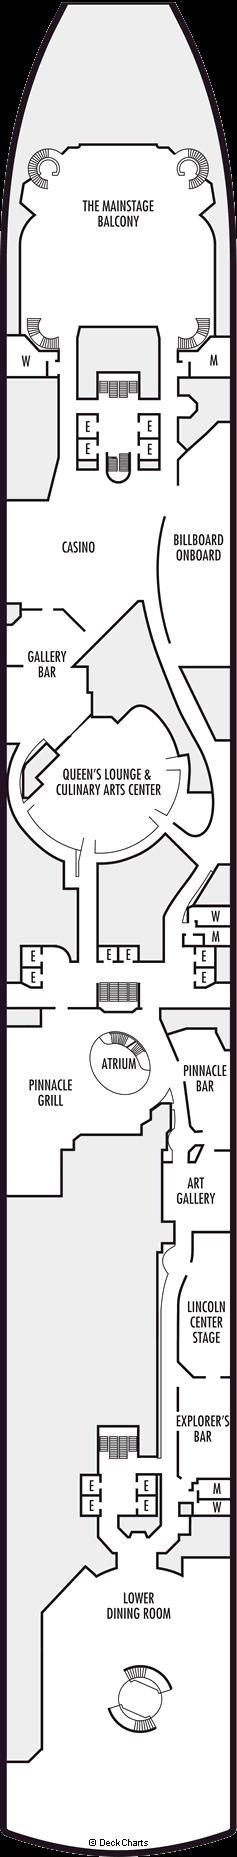 Zuiderdam: Lower Promenade Deck